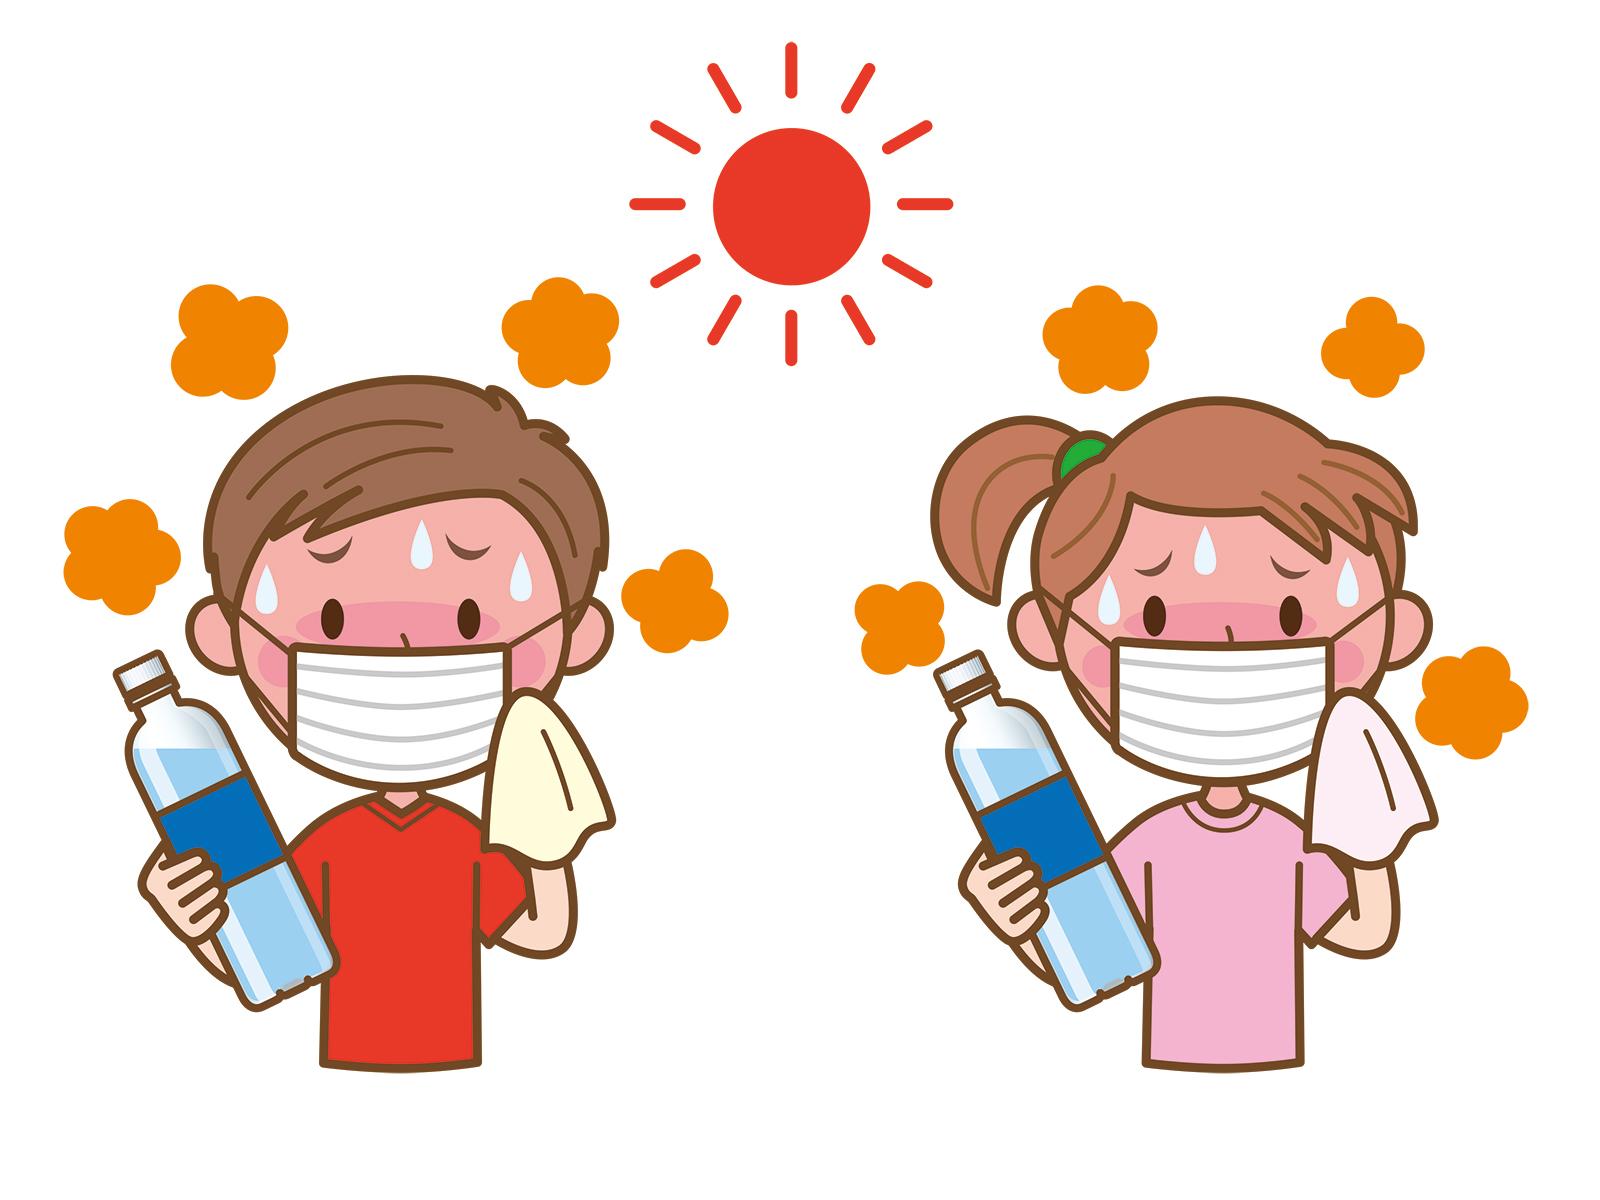 久留米市 今日の最高気温33.2度 全国2番目の暑さ 熱中症注意【6/22】